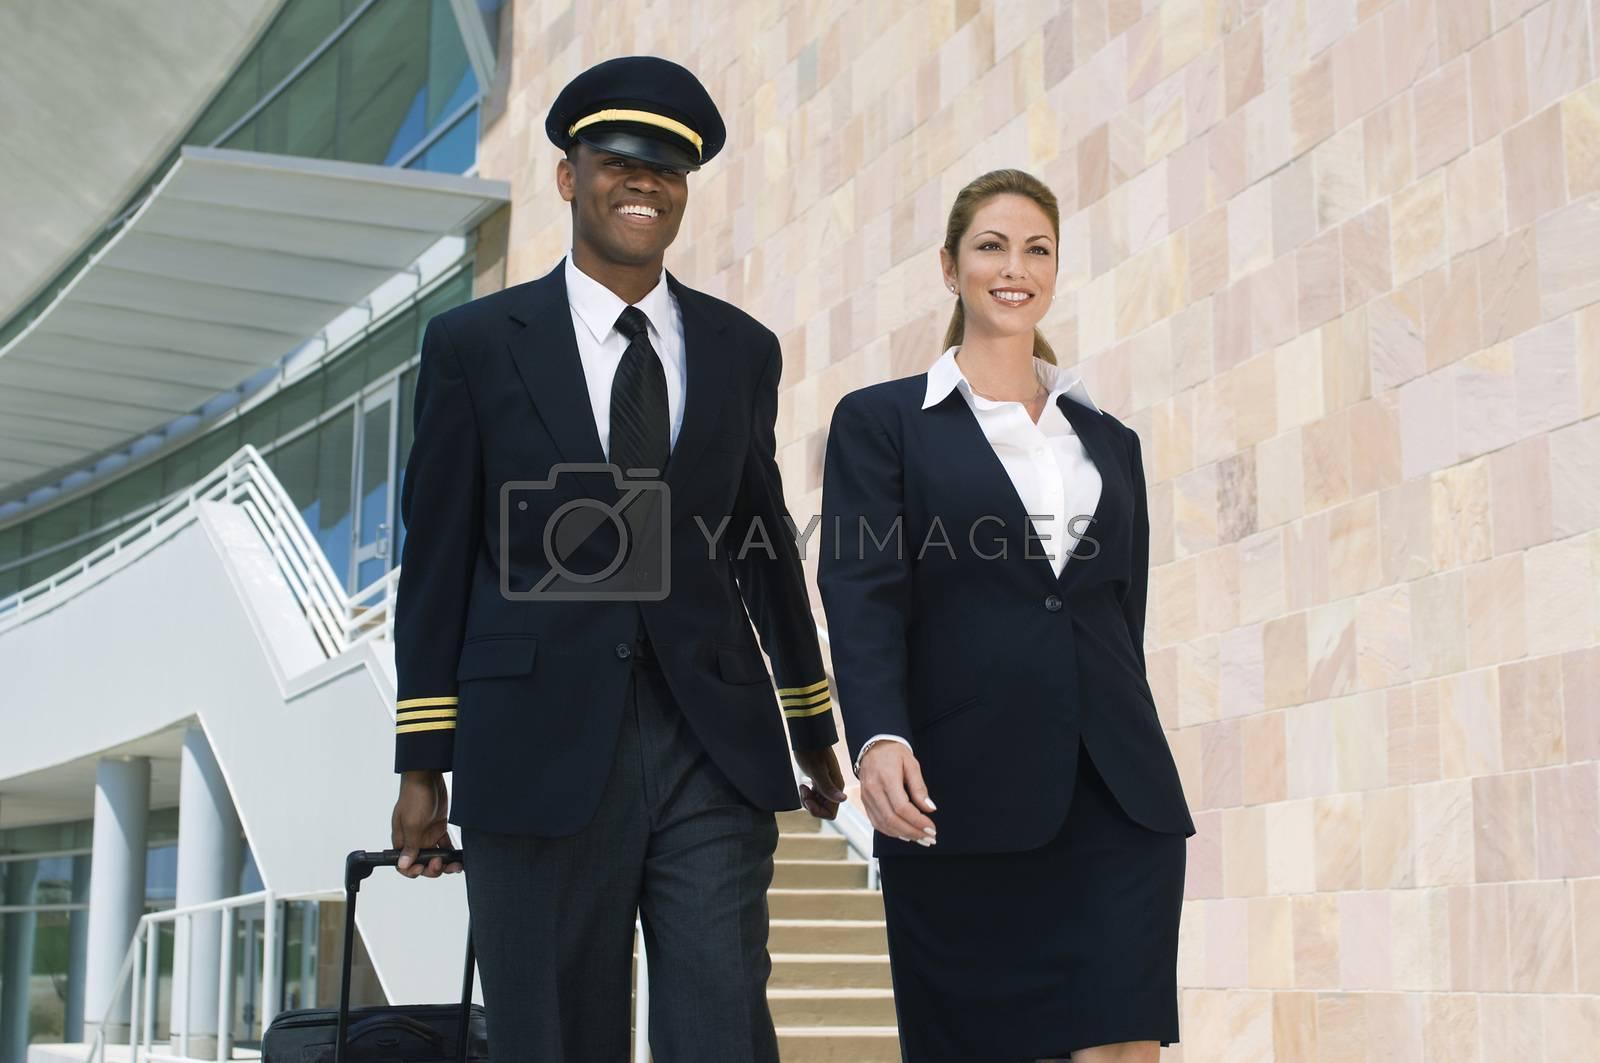 Pilot And Flight Attendant Walking Outside Building